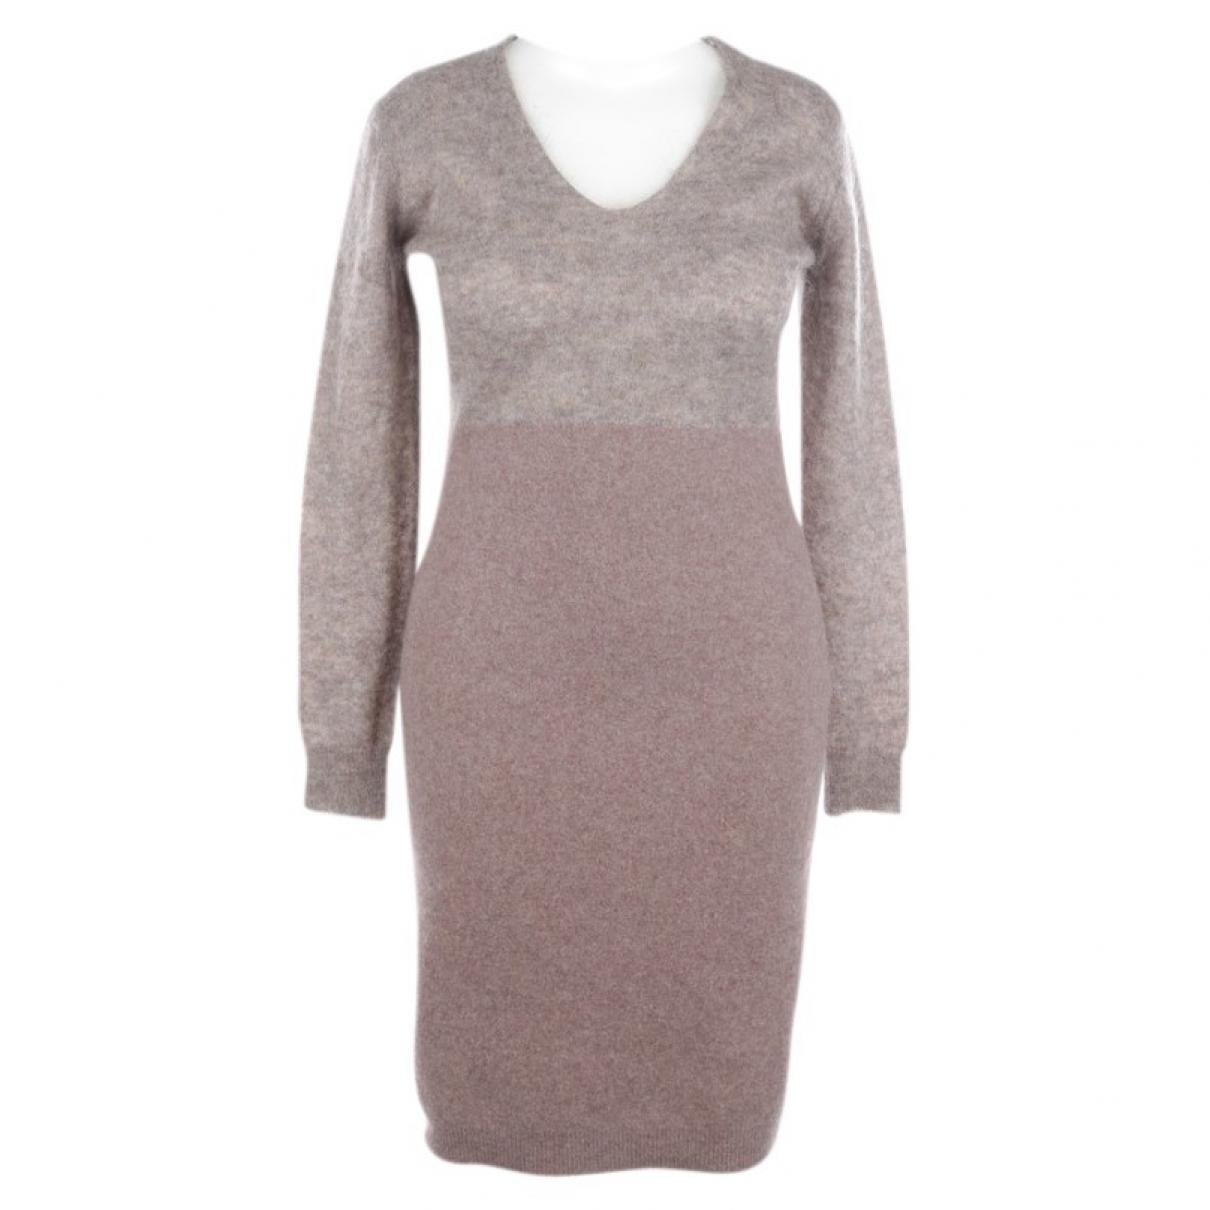 Maison Martin Margiela \N Beige Wool dress for Women XL International